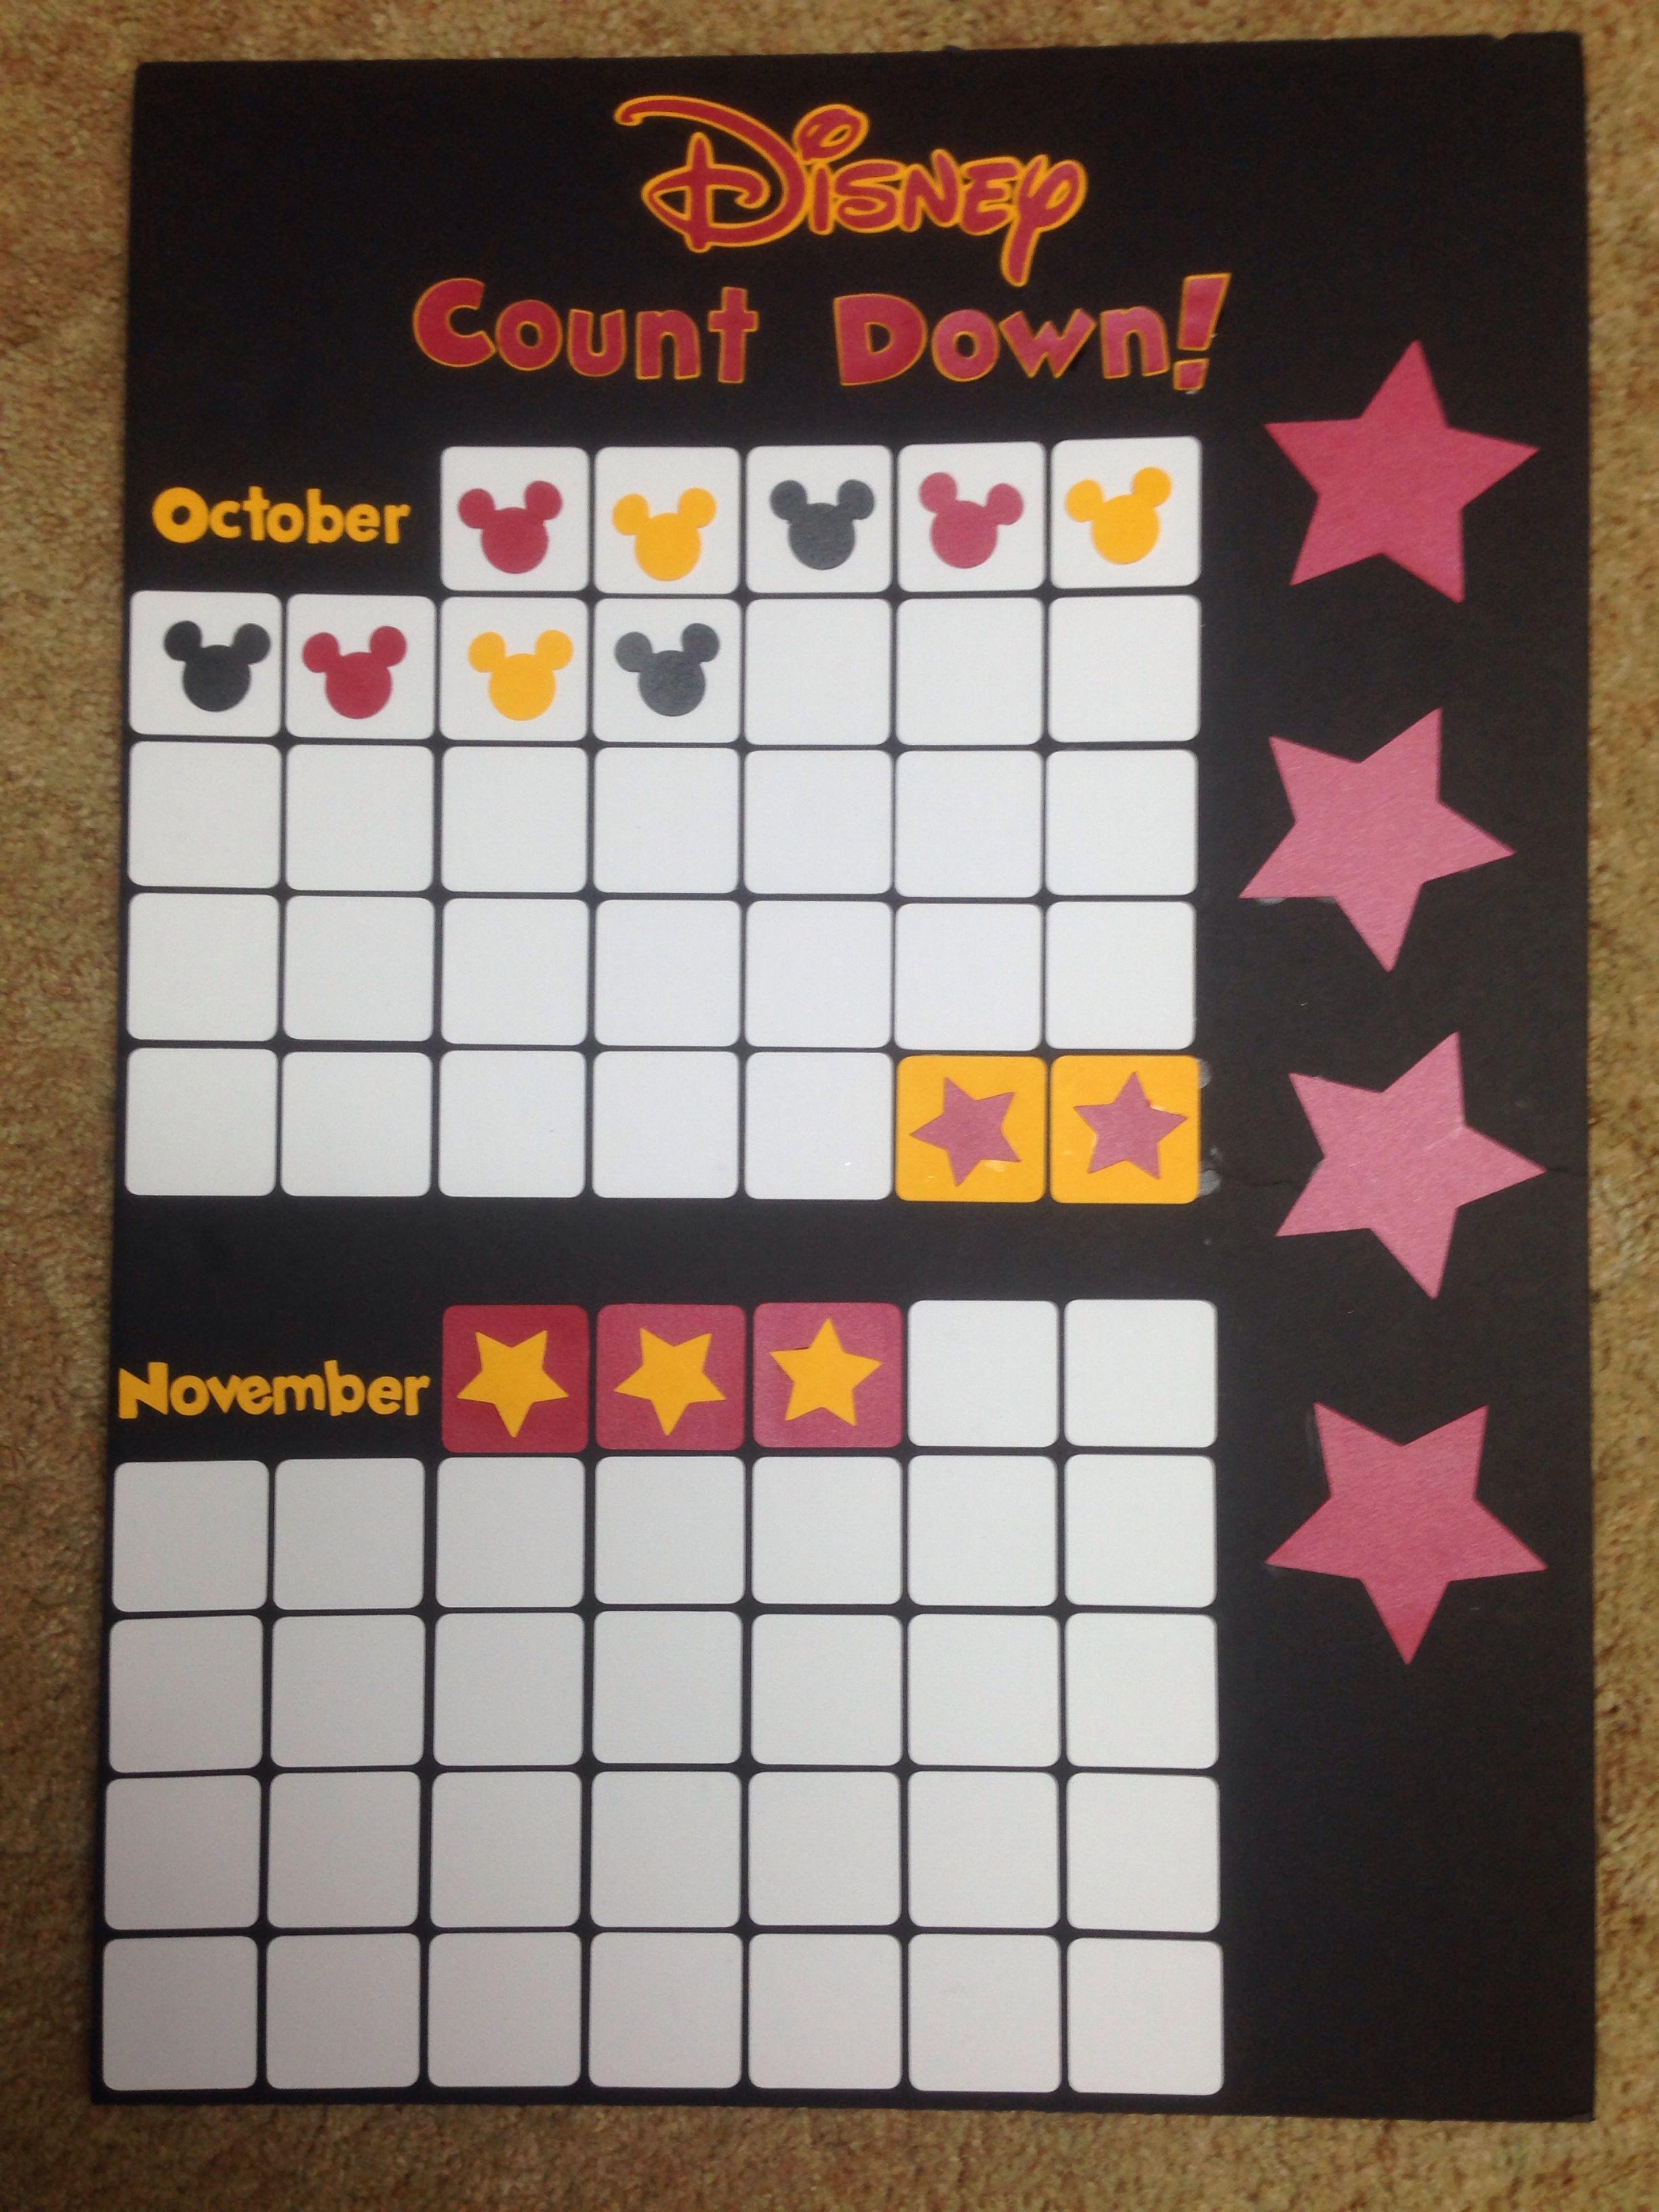 Disney Countdown Calendar!   Alexis' Pinterest Projects